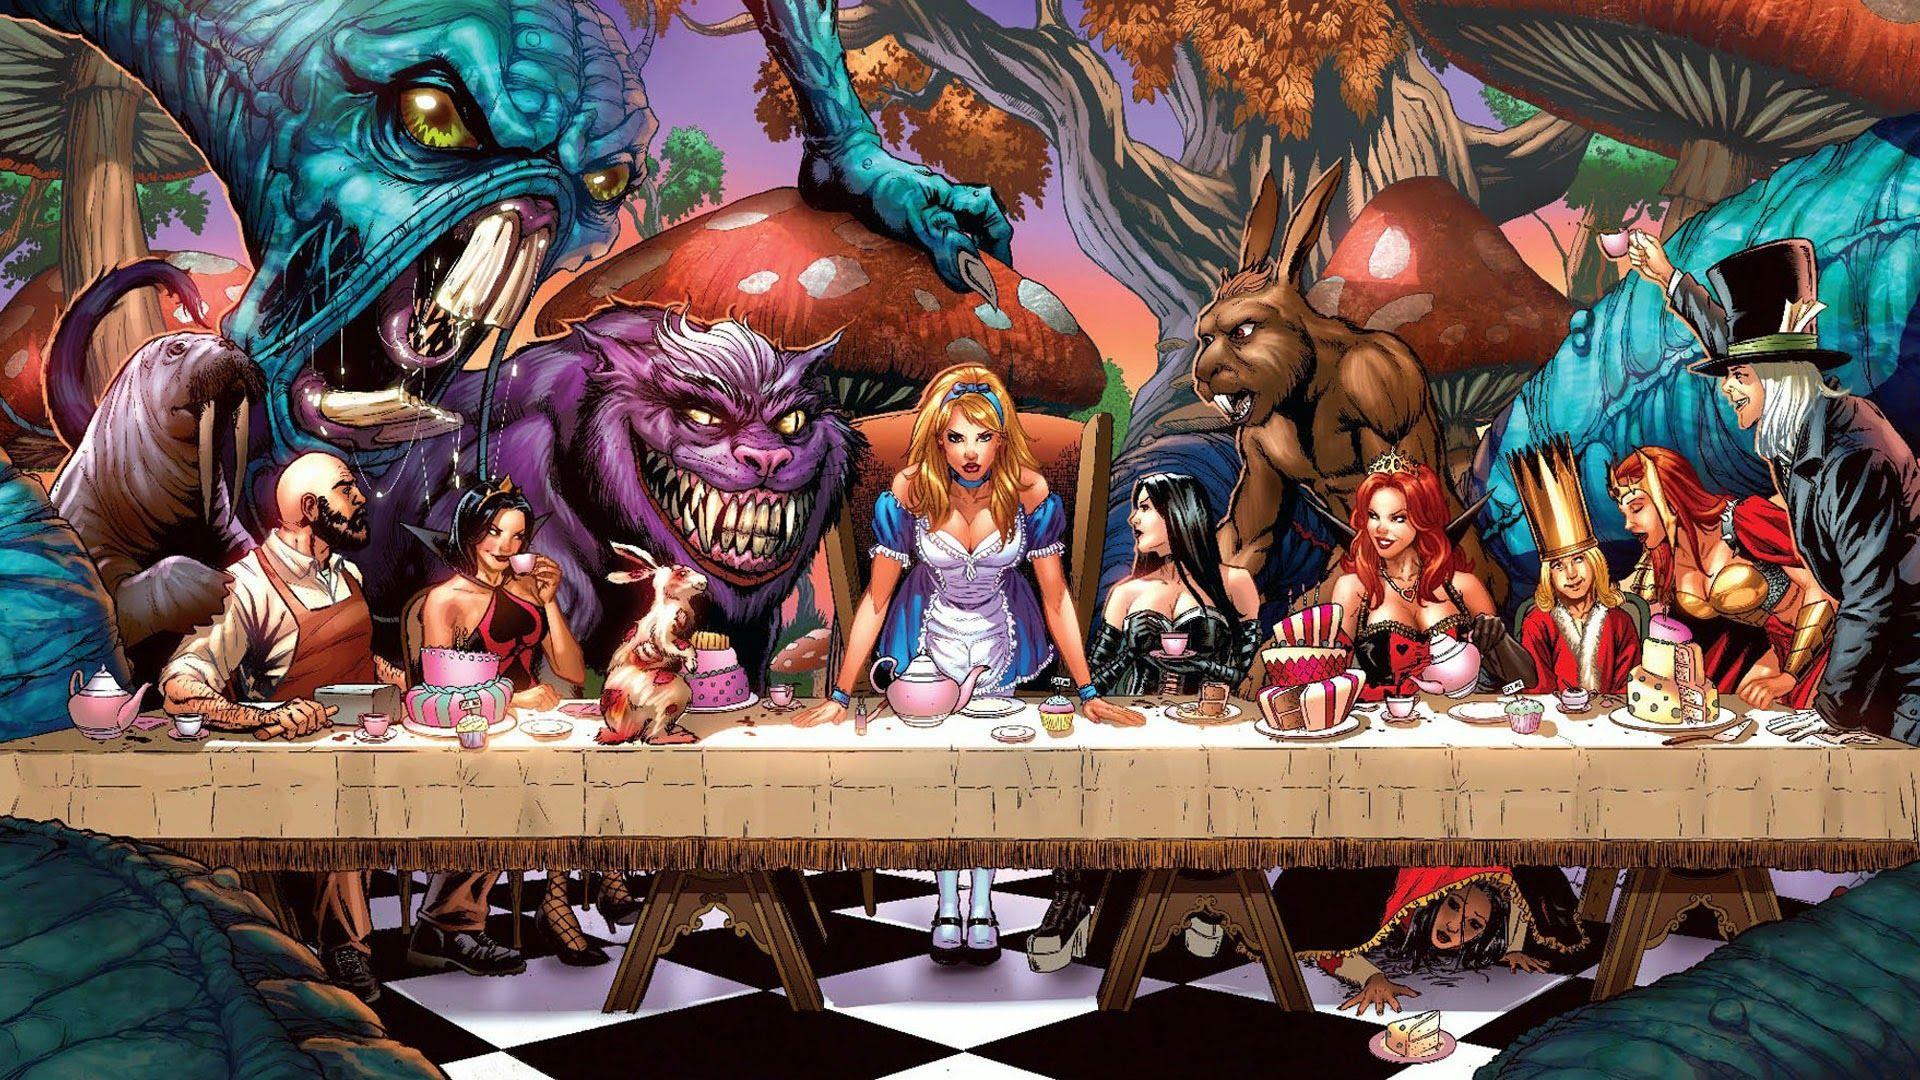 Creepy Alice In Wonderland Full Hd Desktop Wallpaper And Background Image Search Alice In Wonderland Poster Grimm Fairy Tales Wonderland